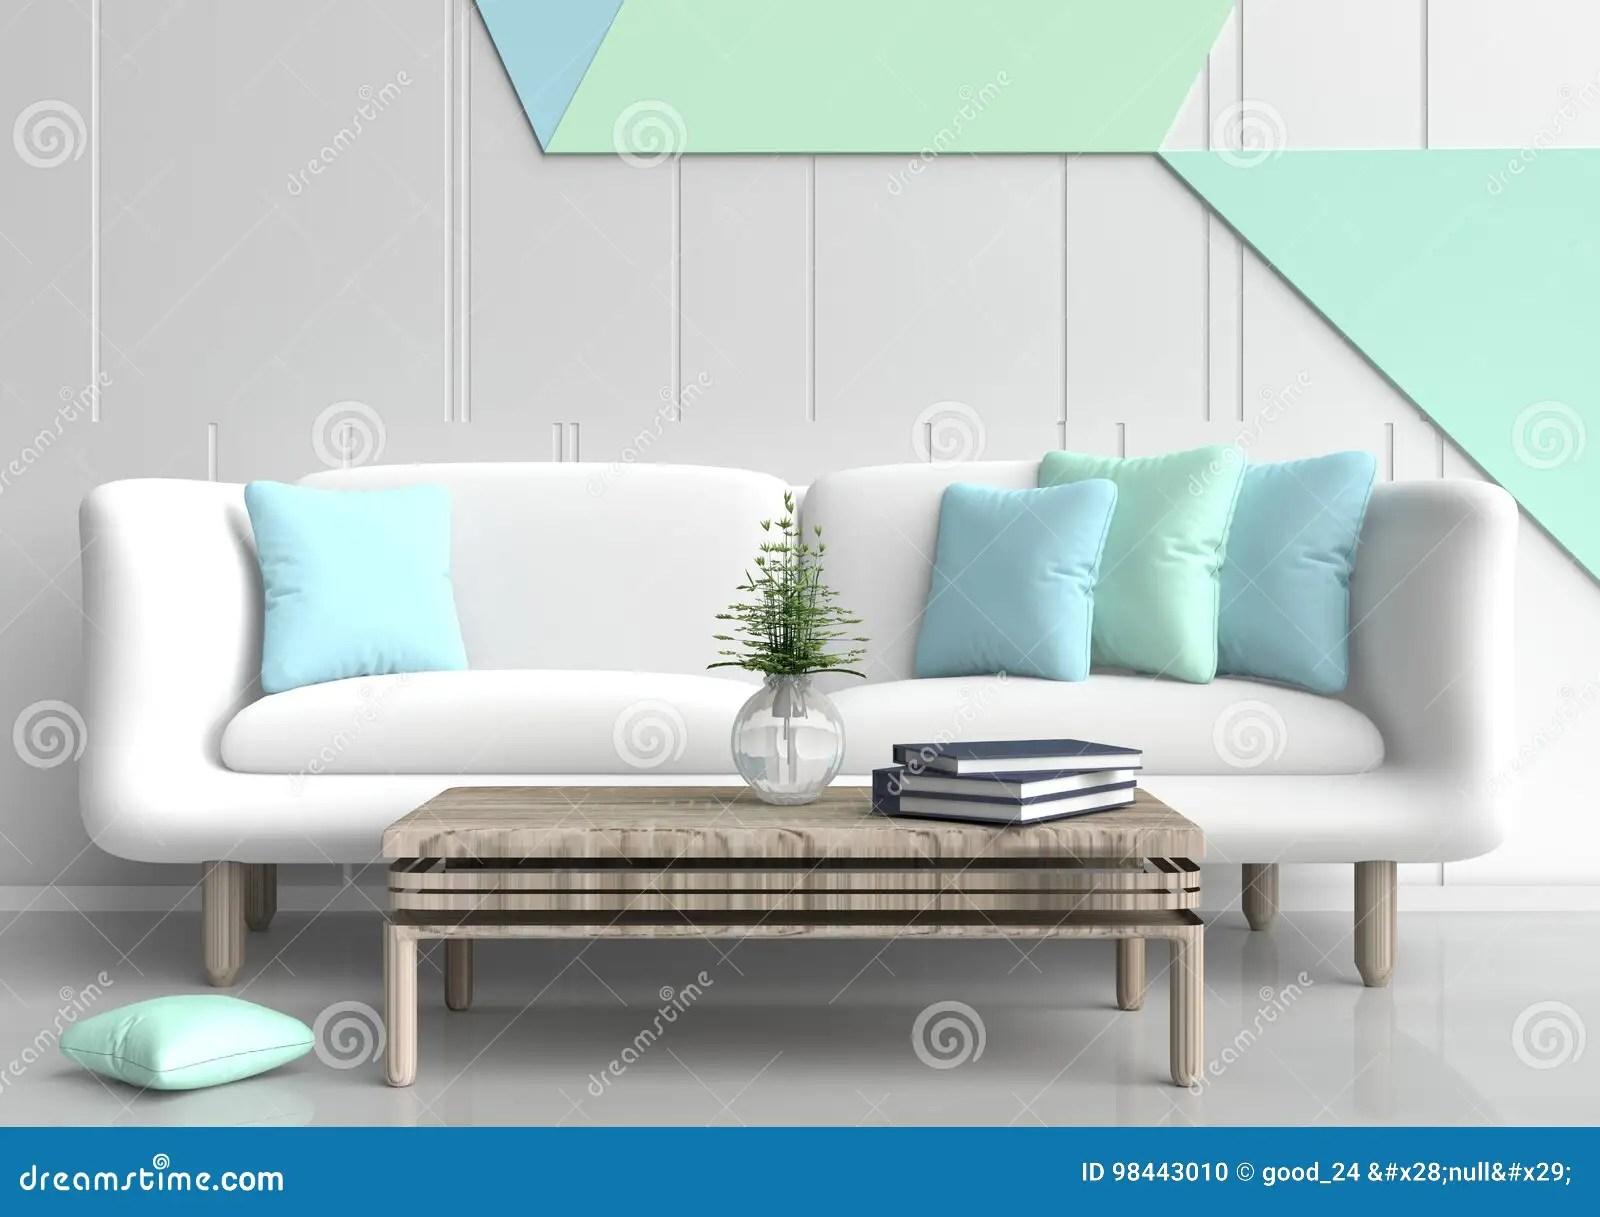 https fr dreamstime com illustration stock salon couleur en pastel image98443010